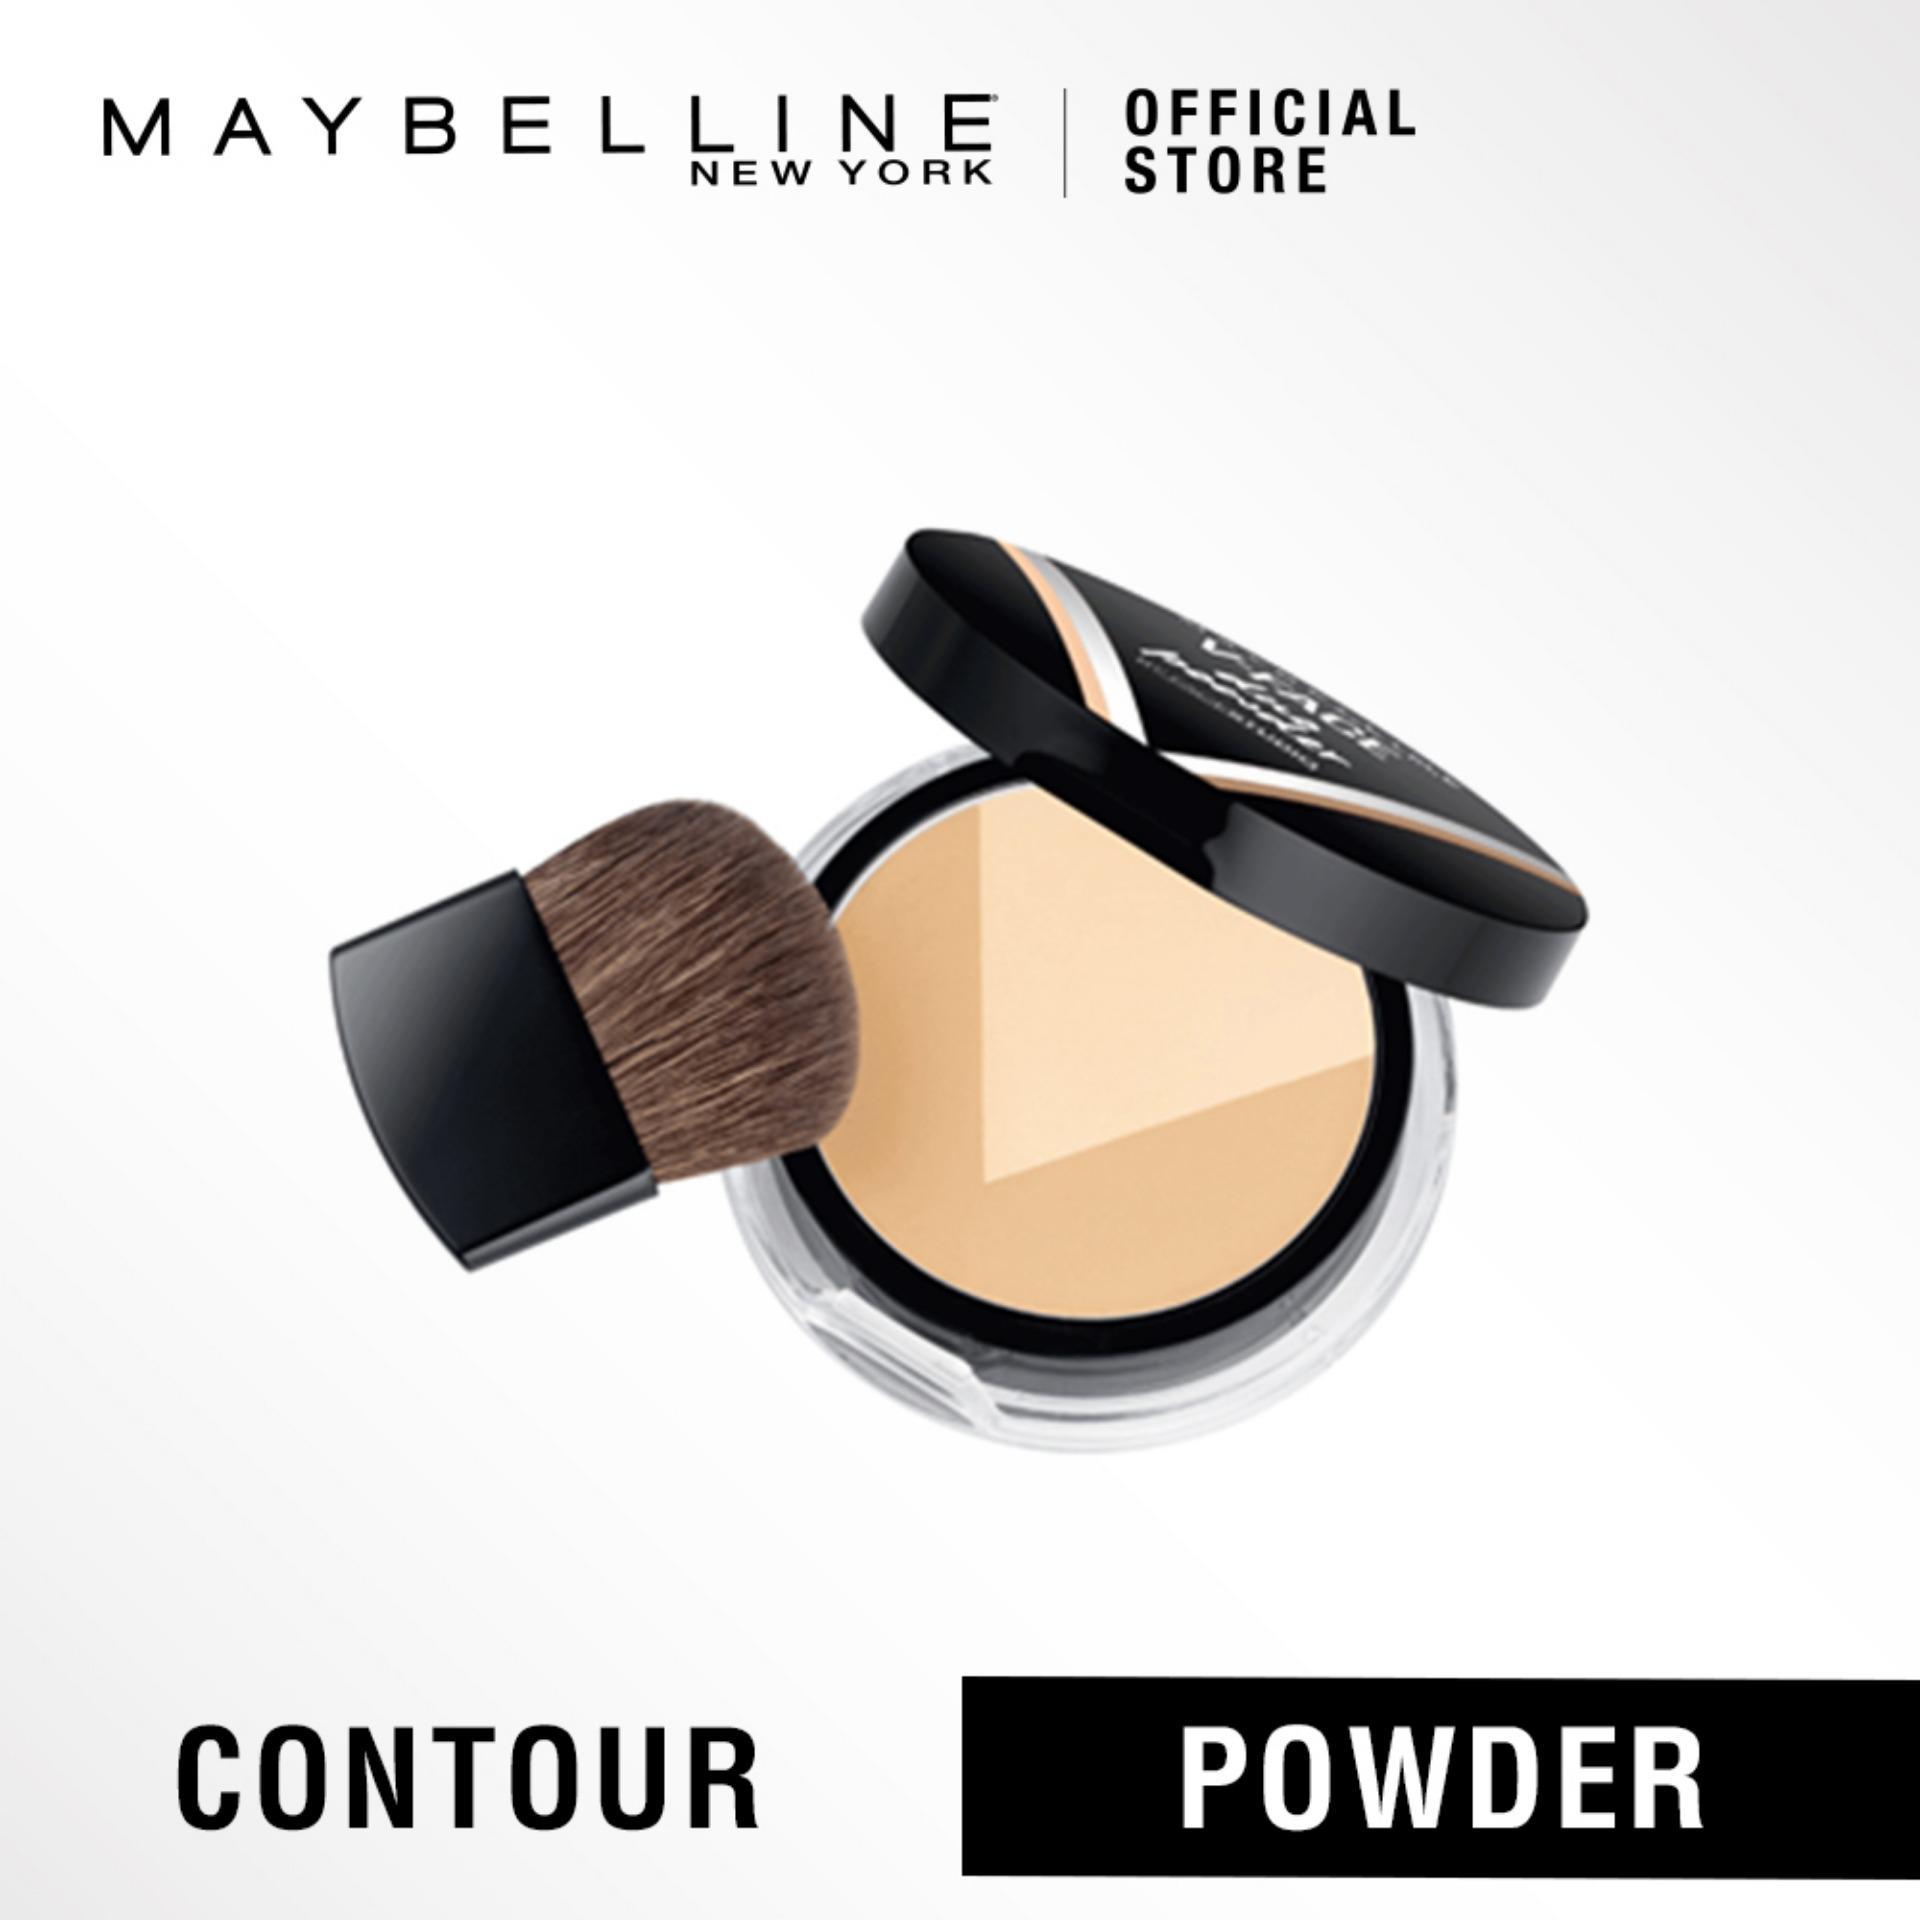 Maybelline V Face Duo Powder Bedak Contouring Light Dark Original Meyne Lazada